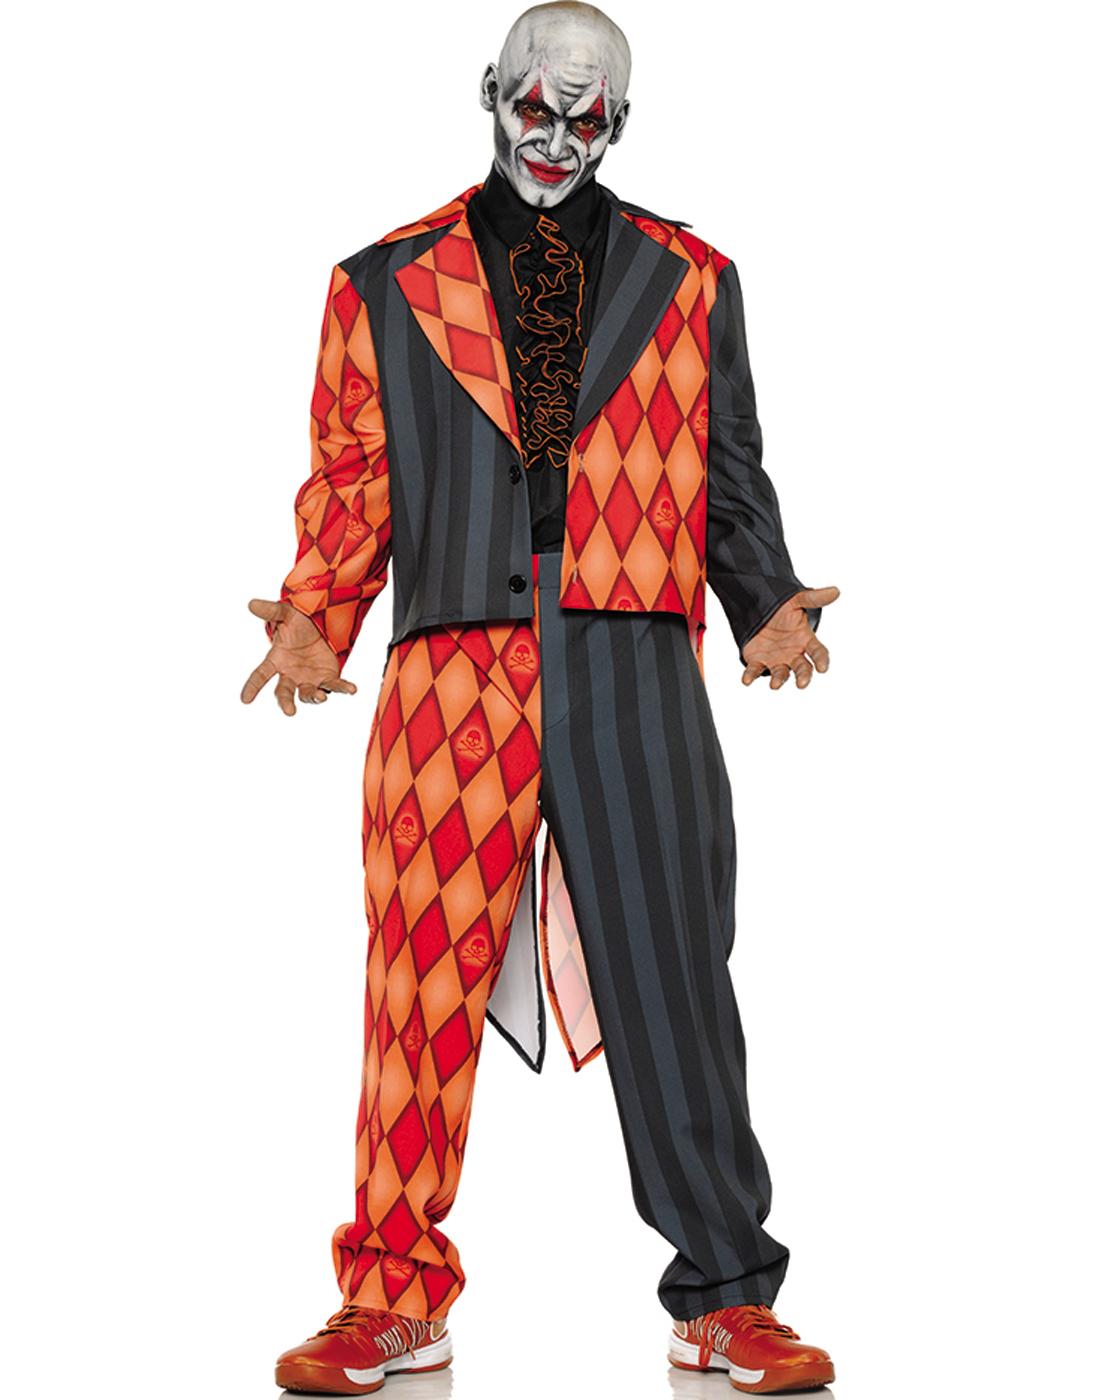 Halloween Costumes Scary Men.Details About Thriller Mens Scary Orange Black Clown Jester Tuxedo Halloween Costume